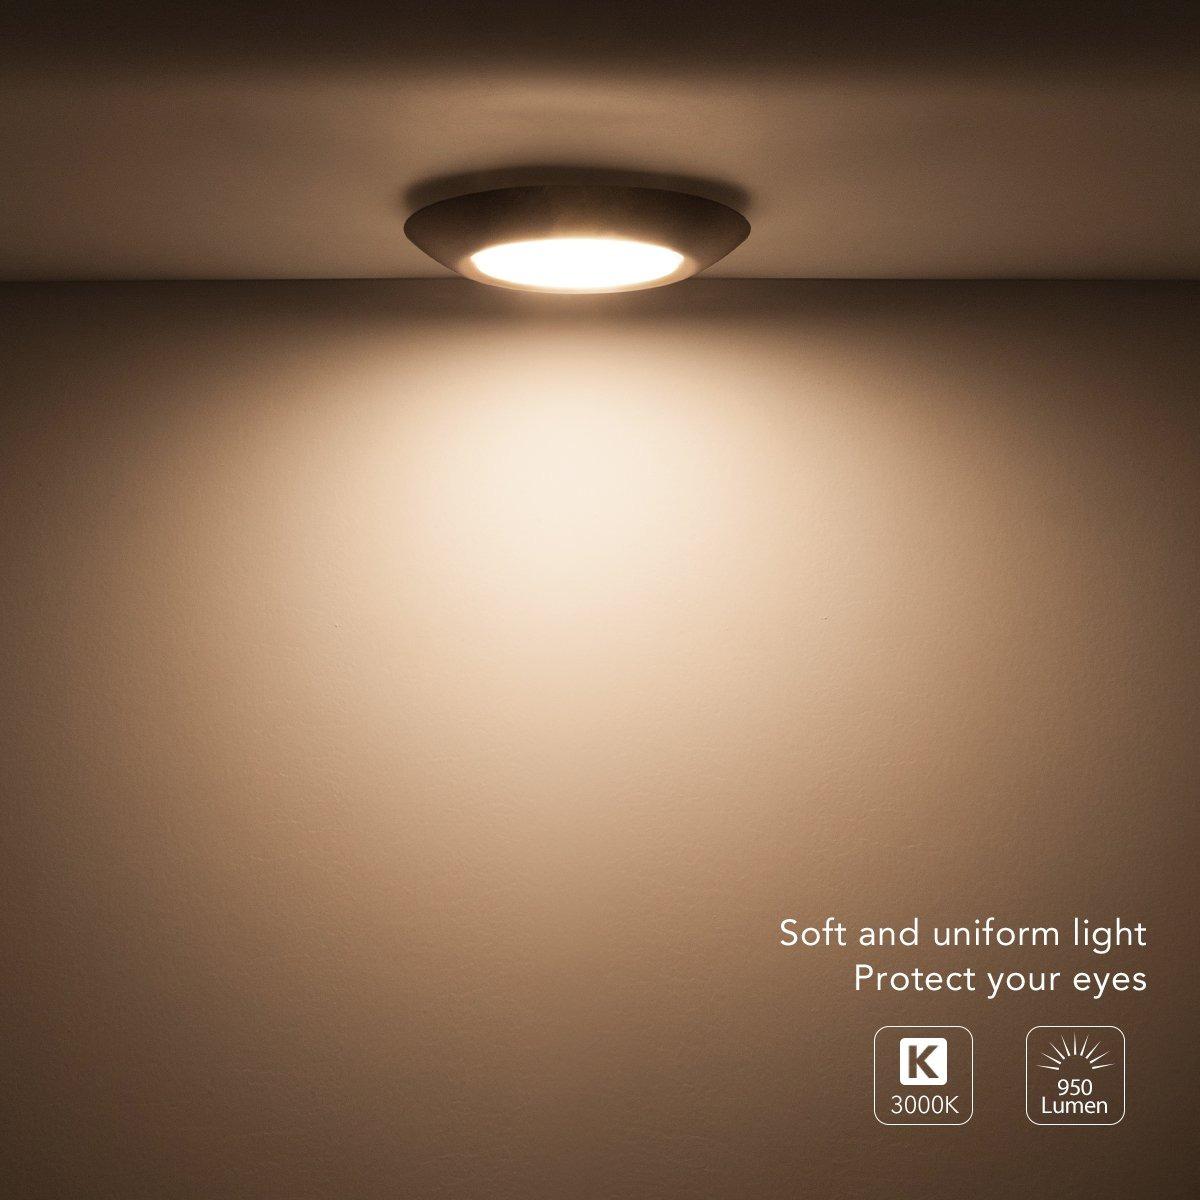 Lámpara Mon 5 De CmCon Techo 7 De Led Solla Regulable 5q3L4jAR